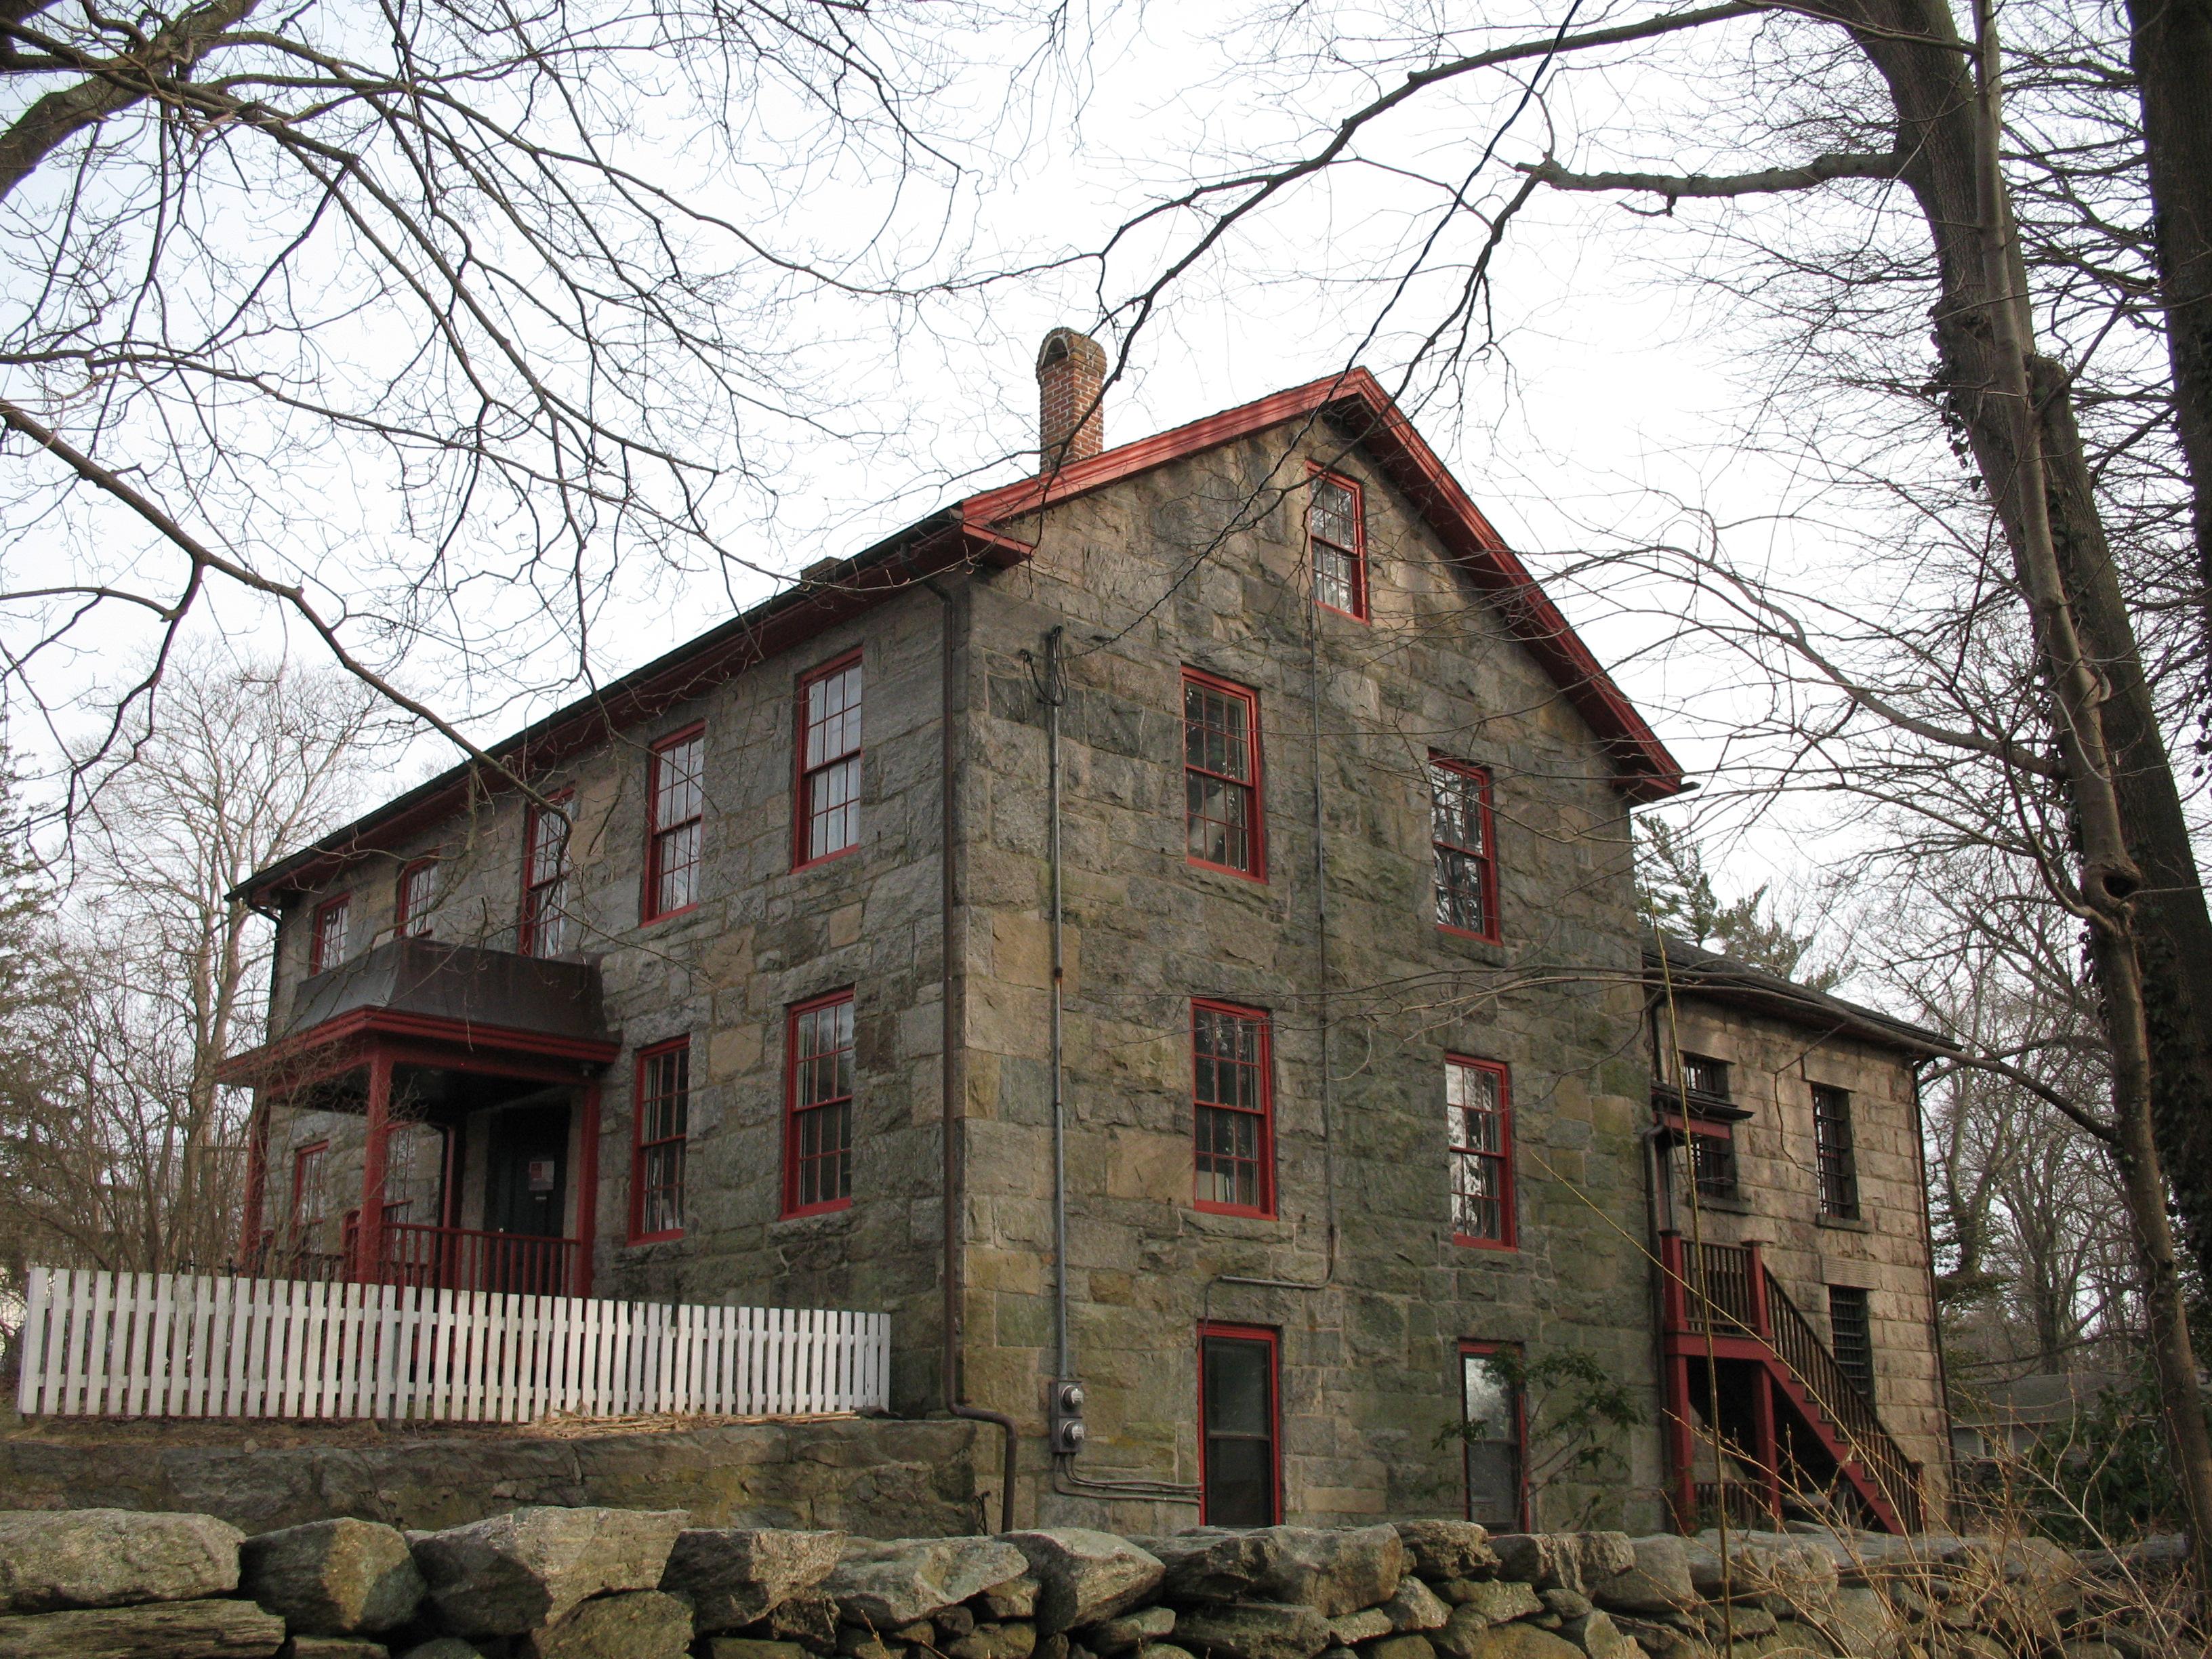 File:Washington County Jailhouse (Pettaquamscutt Historical